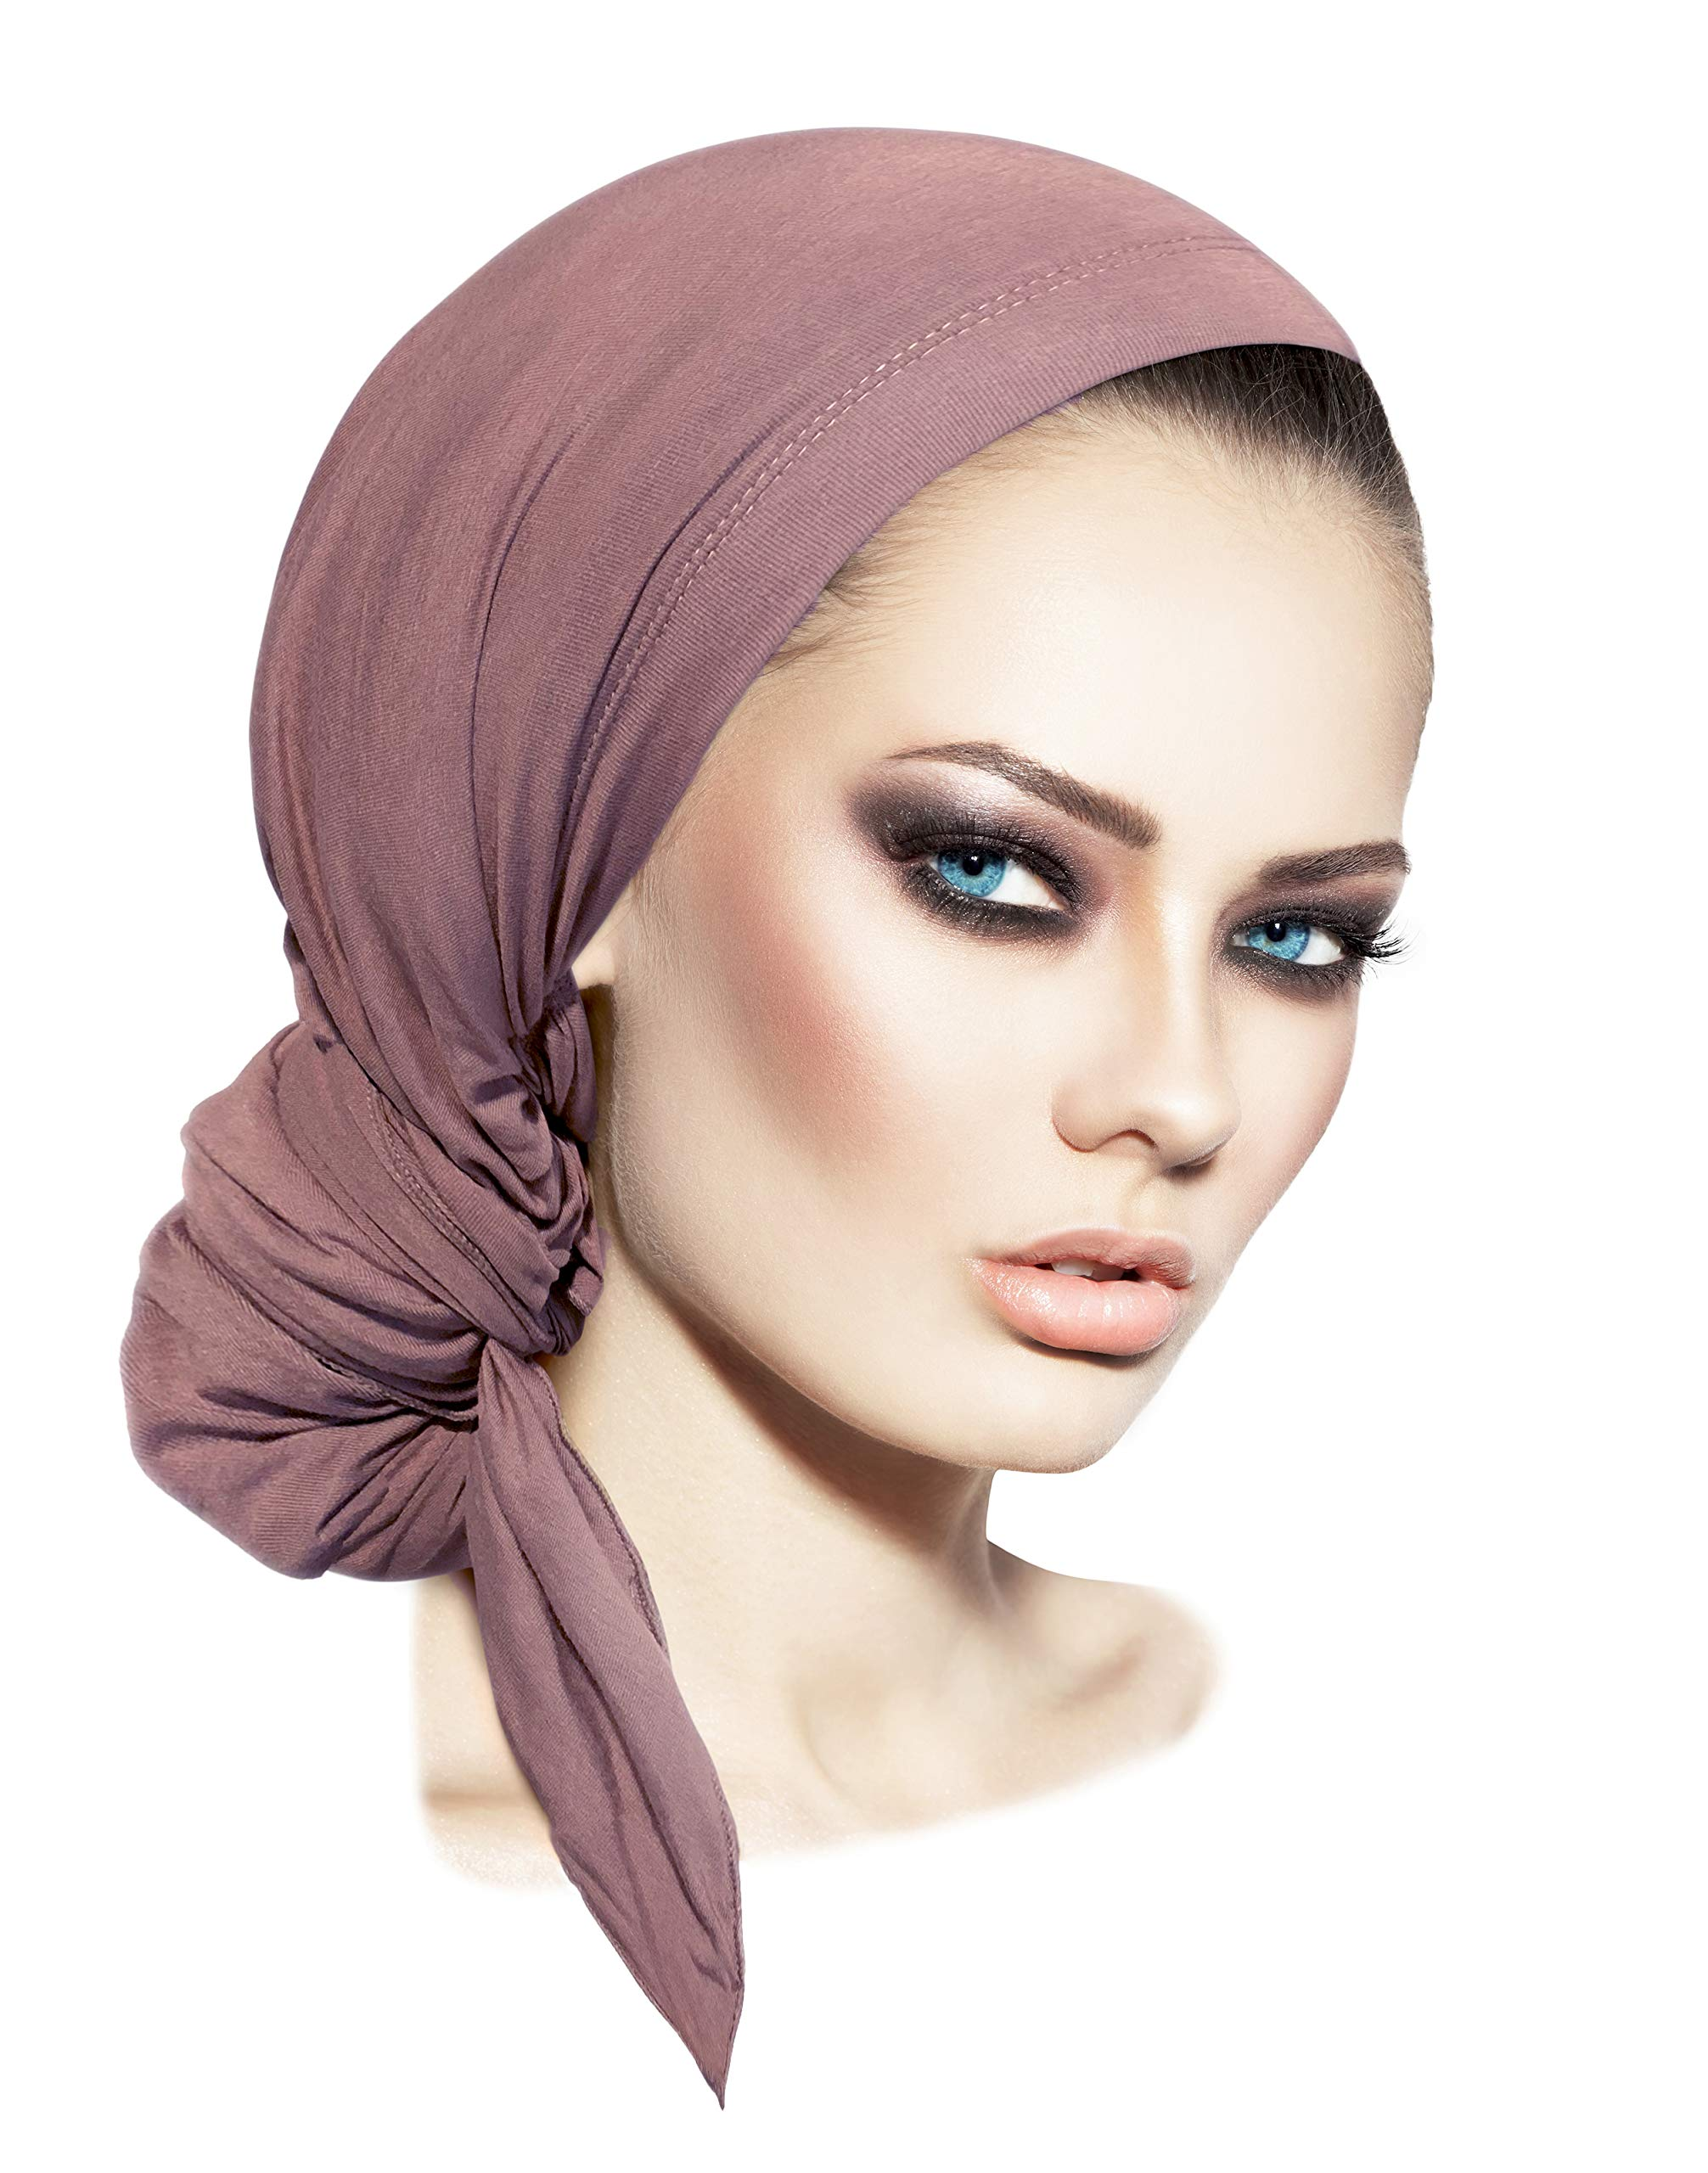 cc54dc79f19 Pre-Tied Head-Scarf Versatile Long Ties Bandana Tichel Headwear Turban Wrap  Soft Cotton